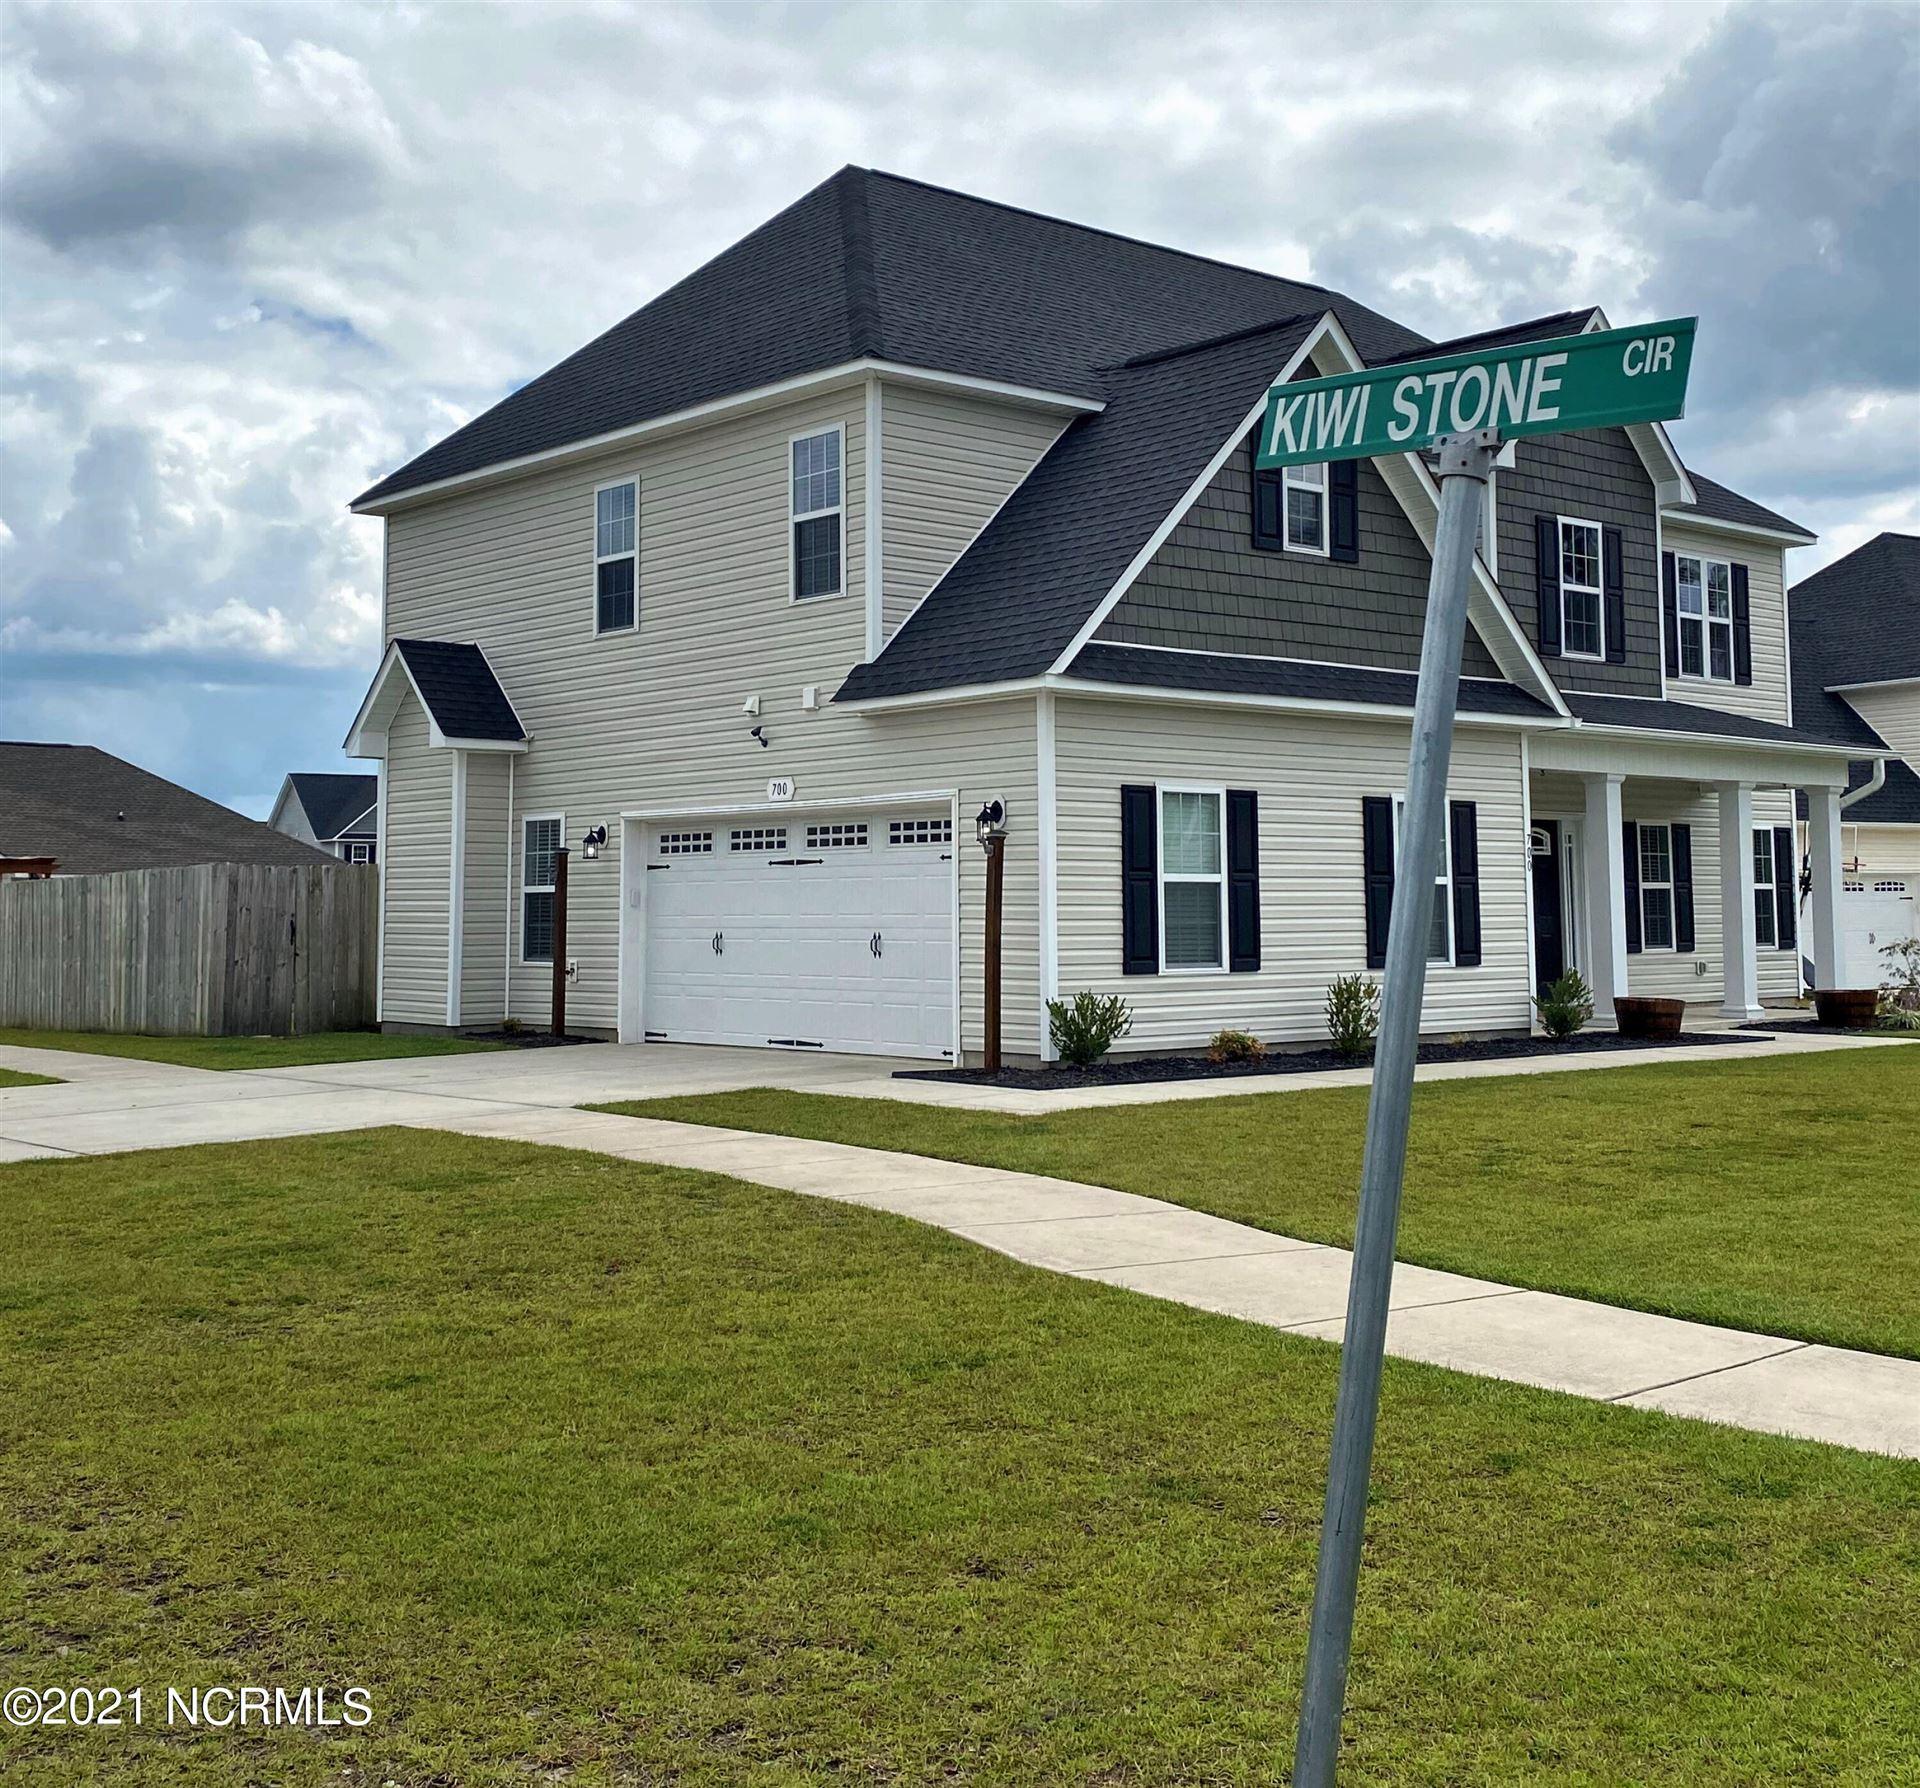 Photo of 700 Kiwi Stone Circle, Jacksonville, NC 28546 (MLS # 100287836)